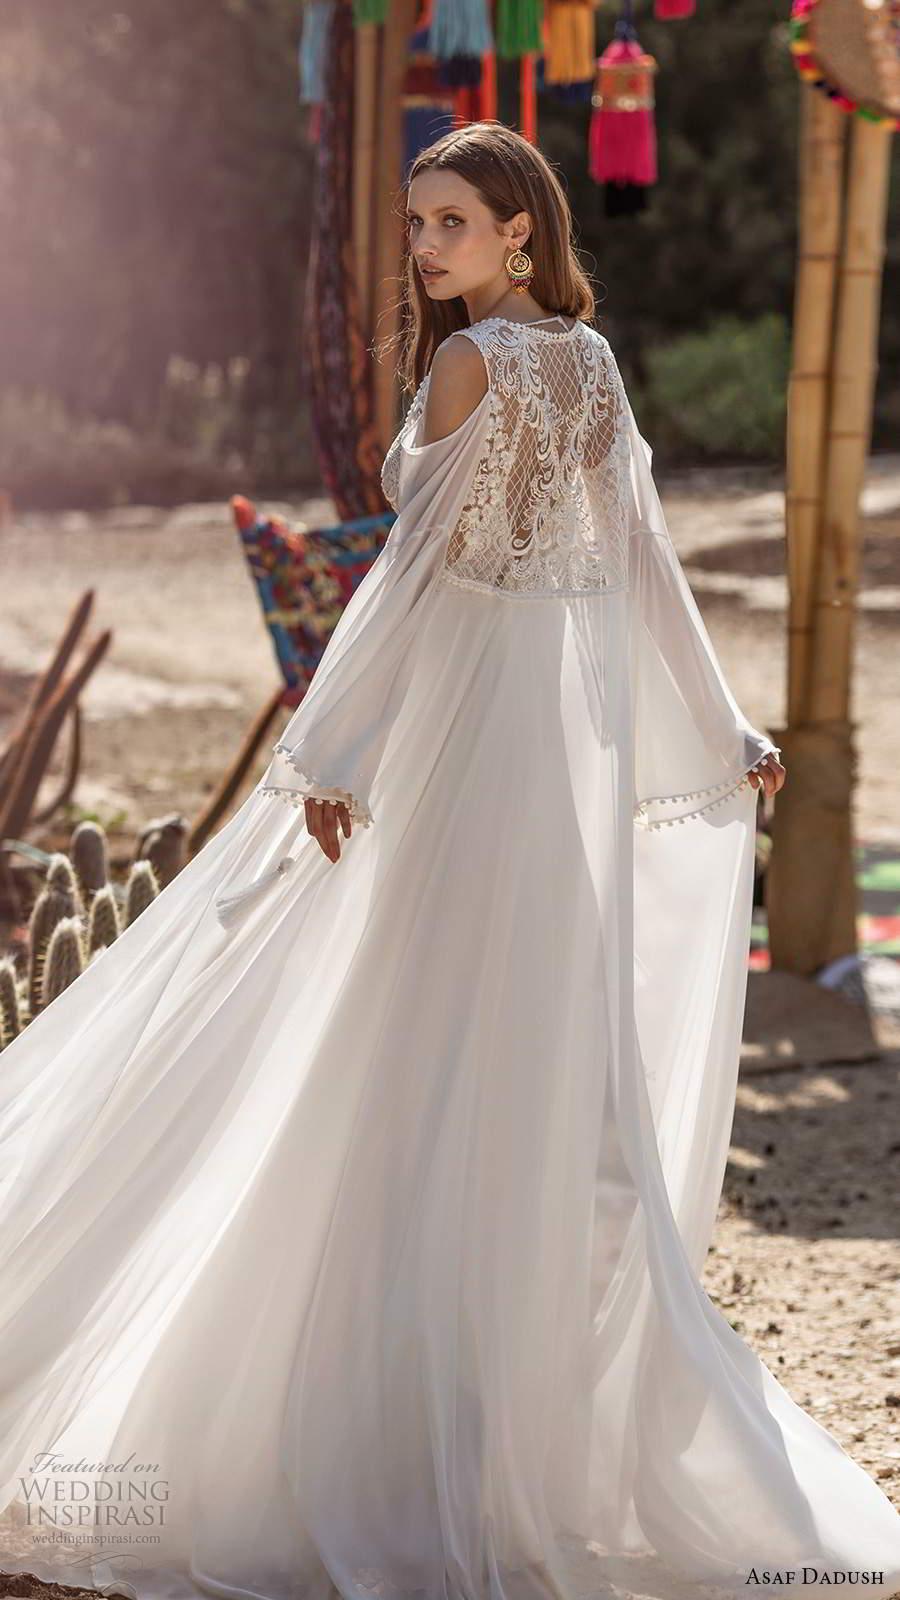 asaf dadush 2020 bridal sleeveless thin straps plunging v neckline embellished bodice clean skirt a line wedding dress slit skirt low back long sleeve jacket (3) bv